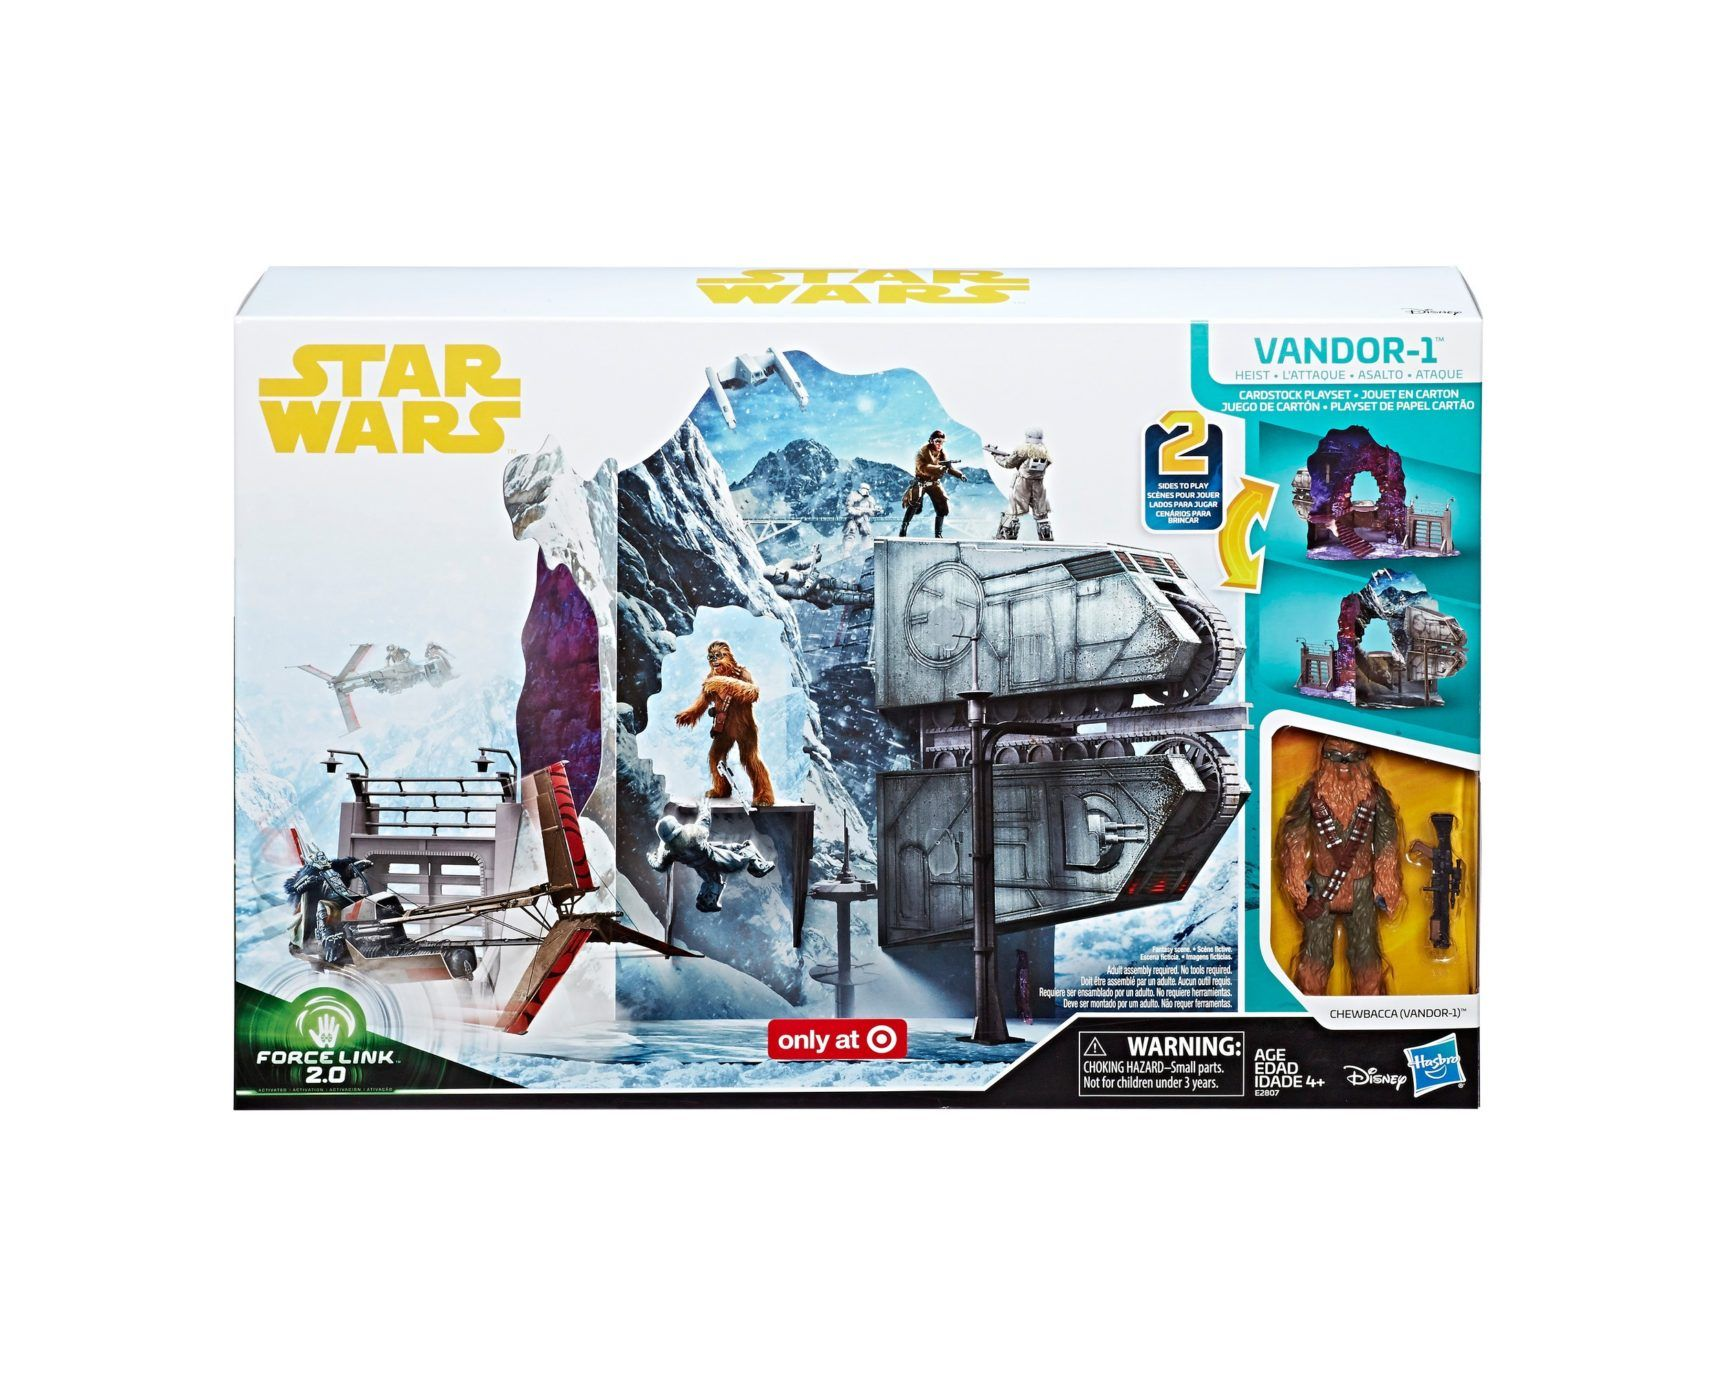 Pressebilder Zum Hasbro Force Link 2 0 Cardboard Playset Vandor 1 Heist War Stories Star Wars Star Wars Toys